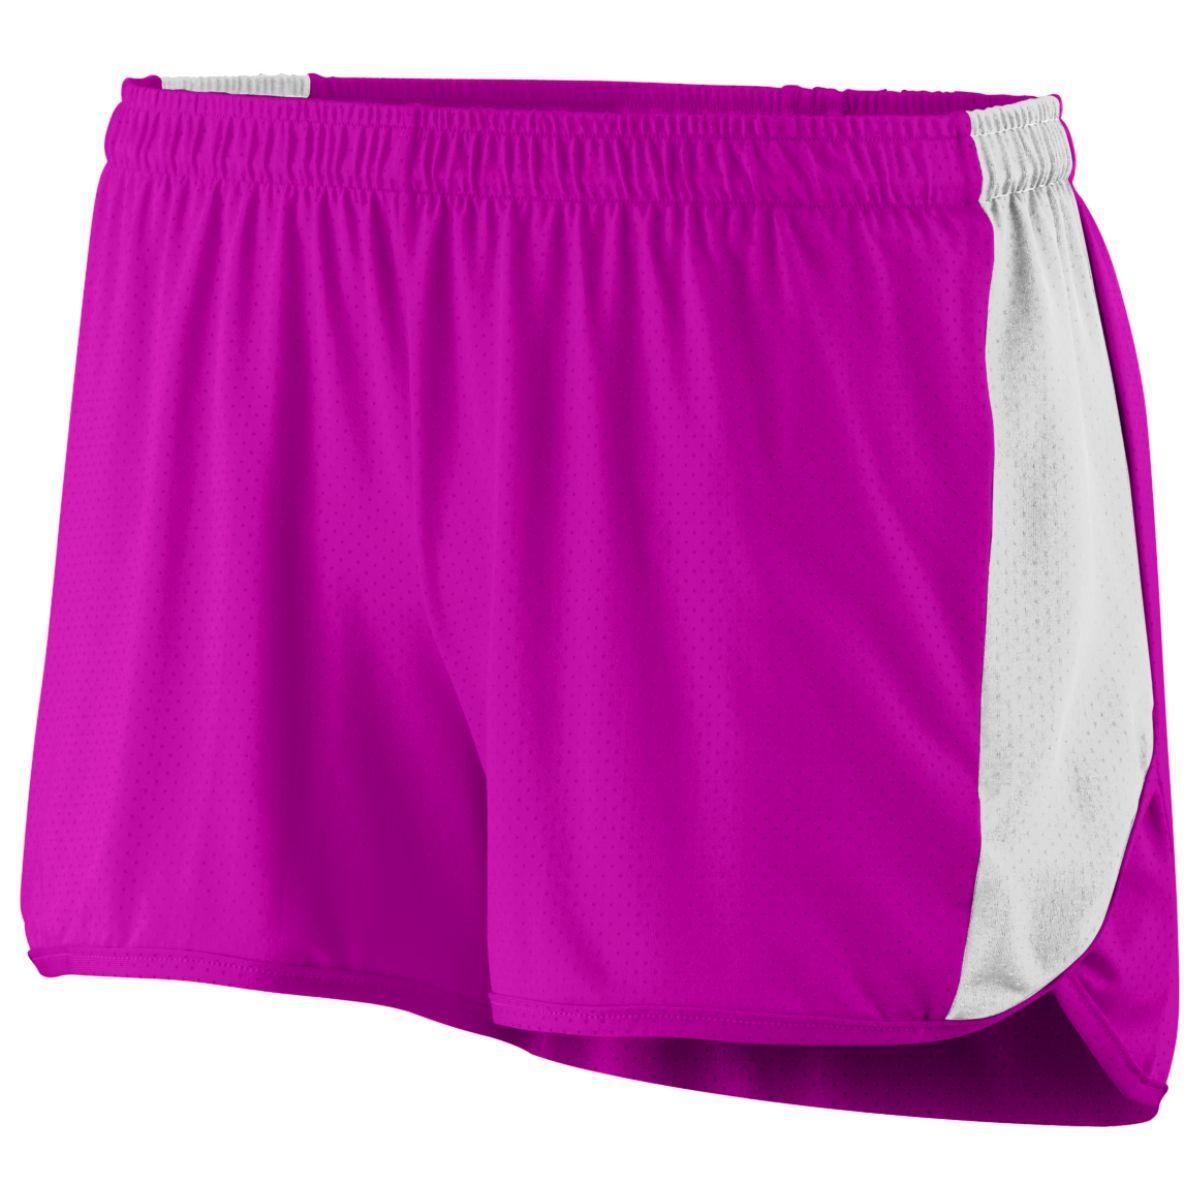 Ladies Sprint Shorts - POWER PINK/WHITE